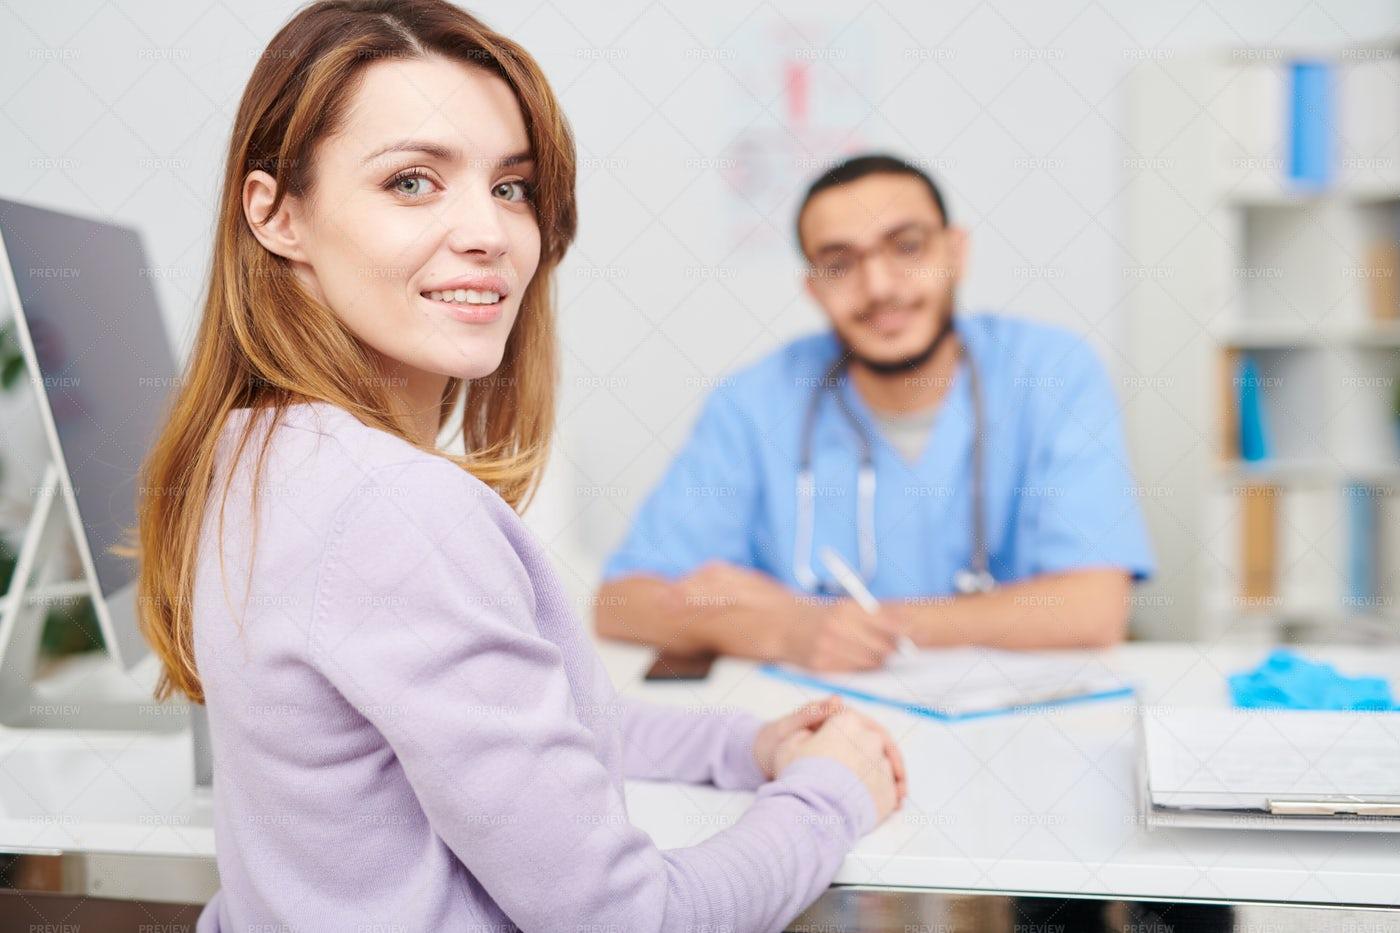 Beautiful Woman Posing In Doctors...: Stock Photos